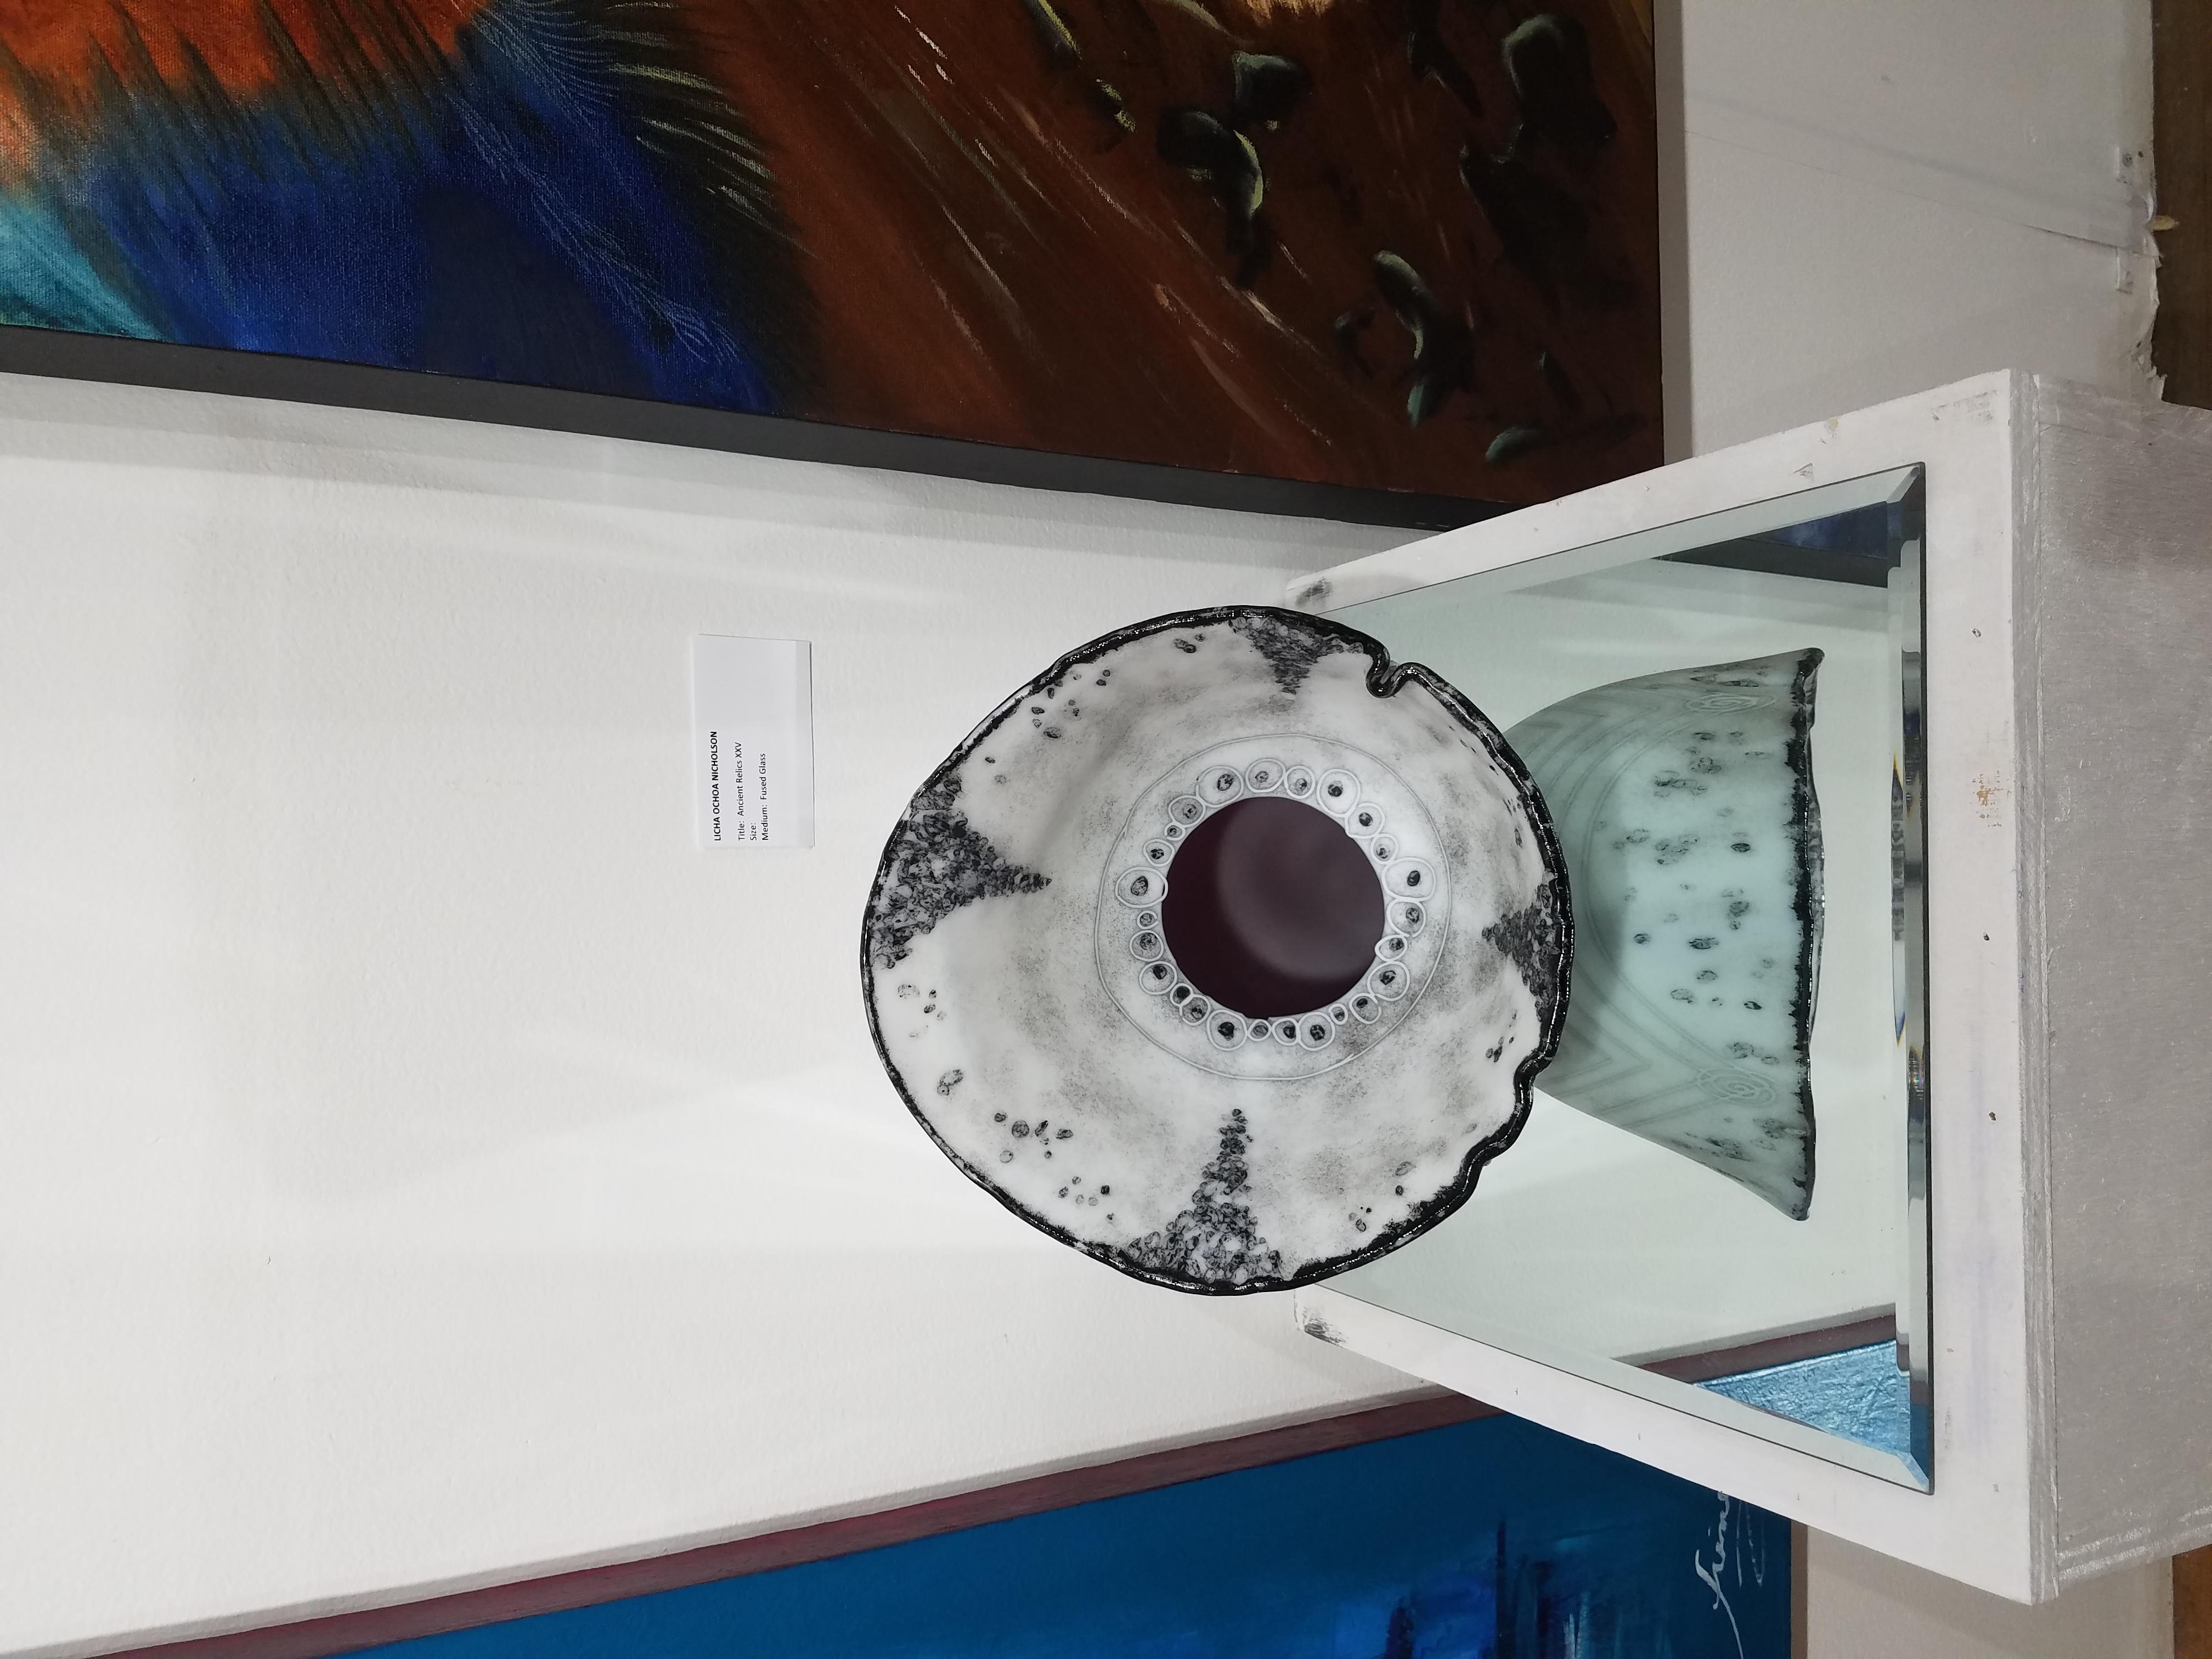 Fused glass vessel from Licha Ochoa